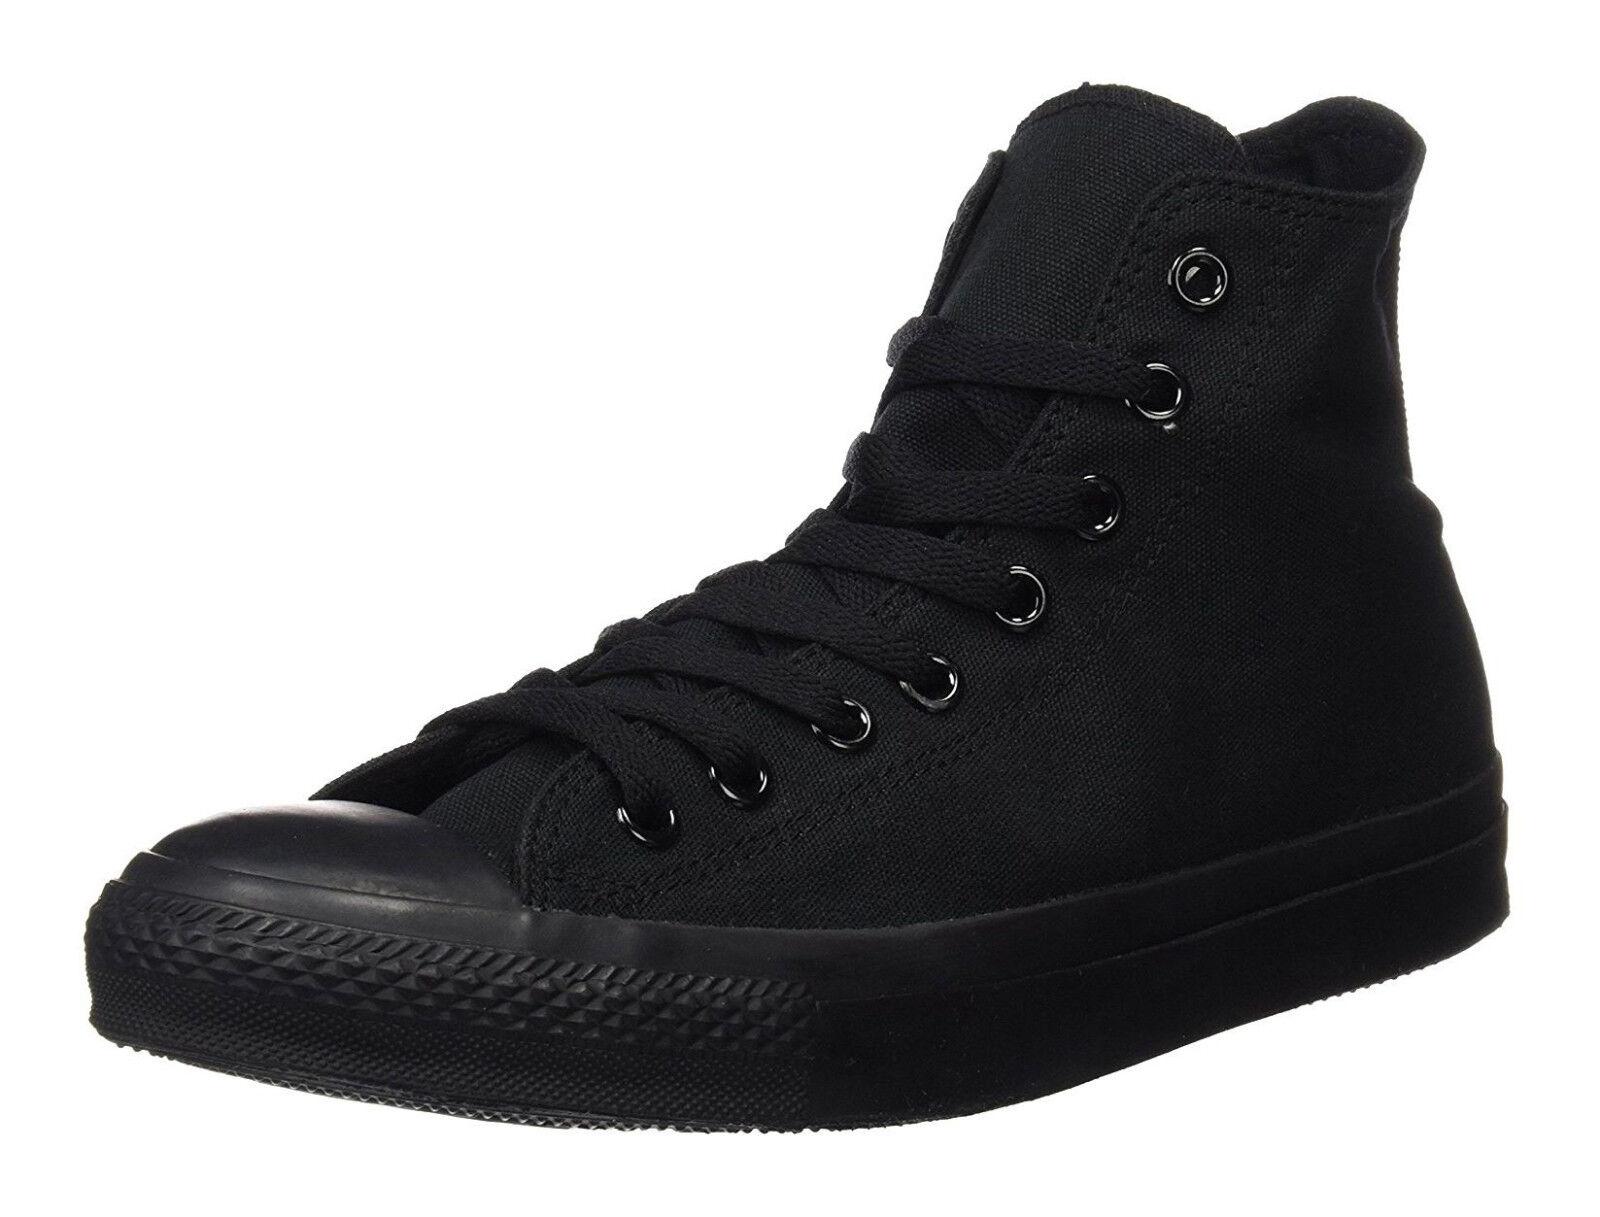 Converse Chuck Taylor Hi Tops Tops Tops Black Mono Womens Sneakers Tennis shoes M3310 4a8687